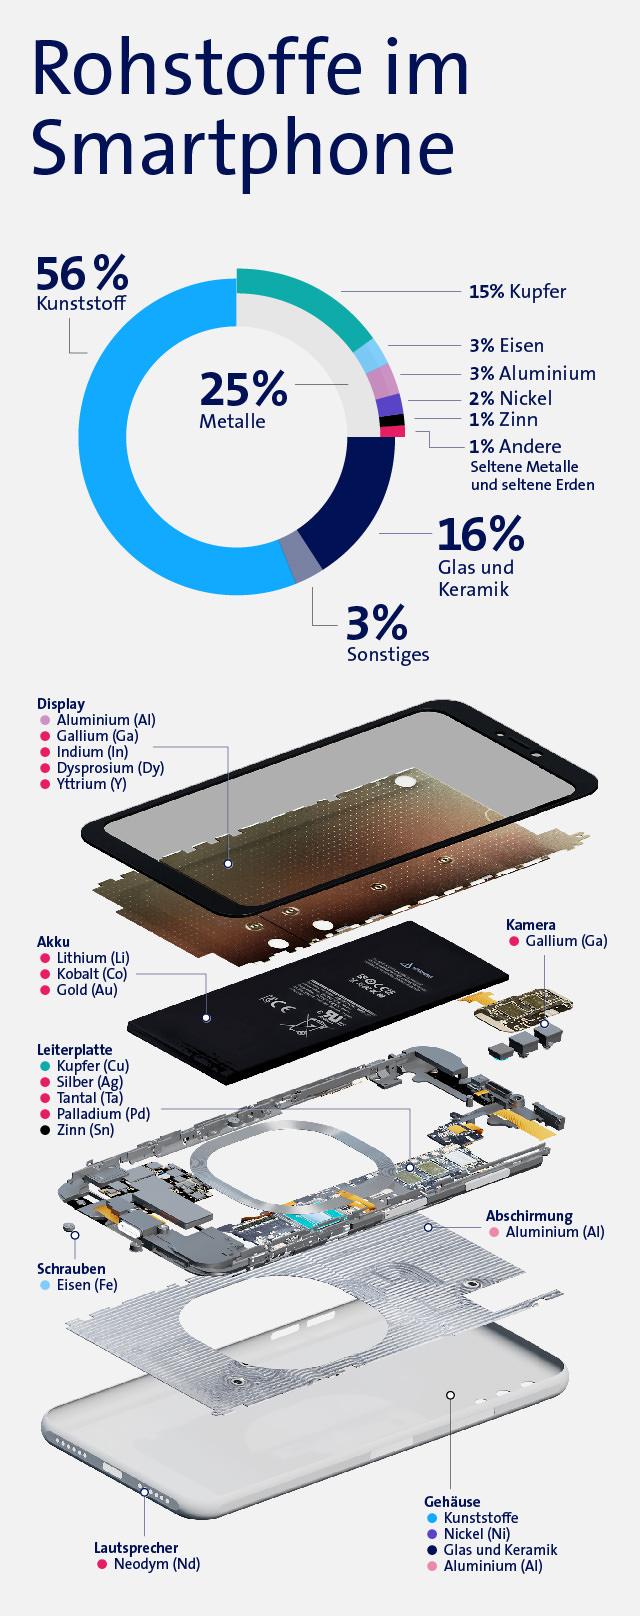 Rohstoffe im Smartphone